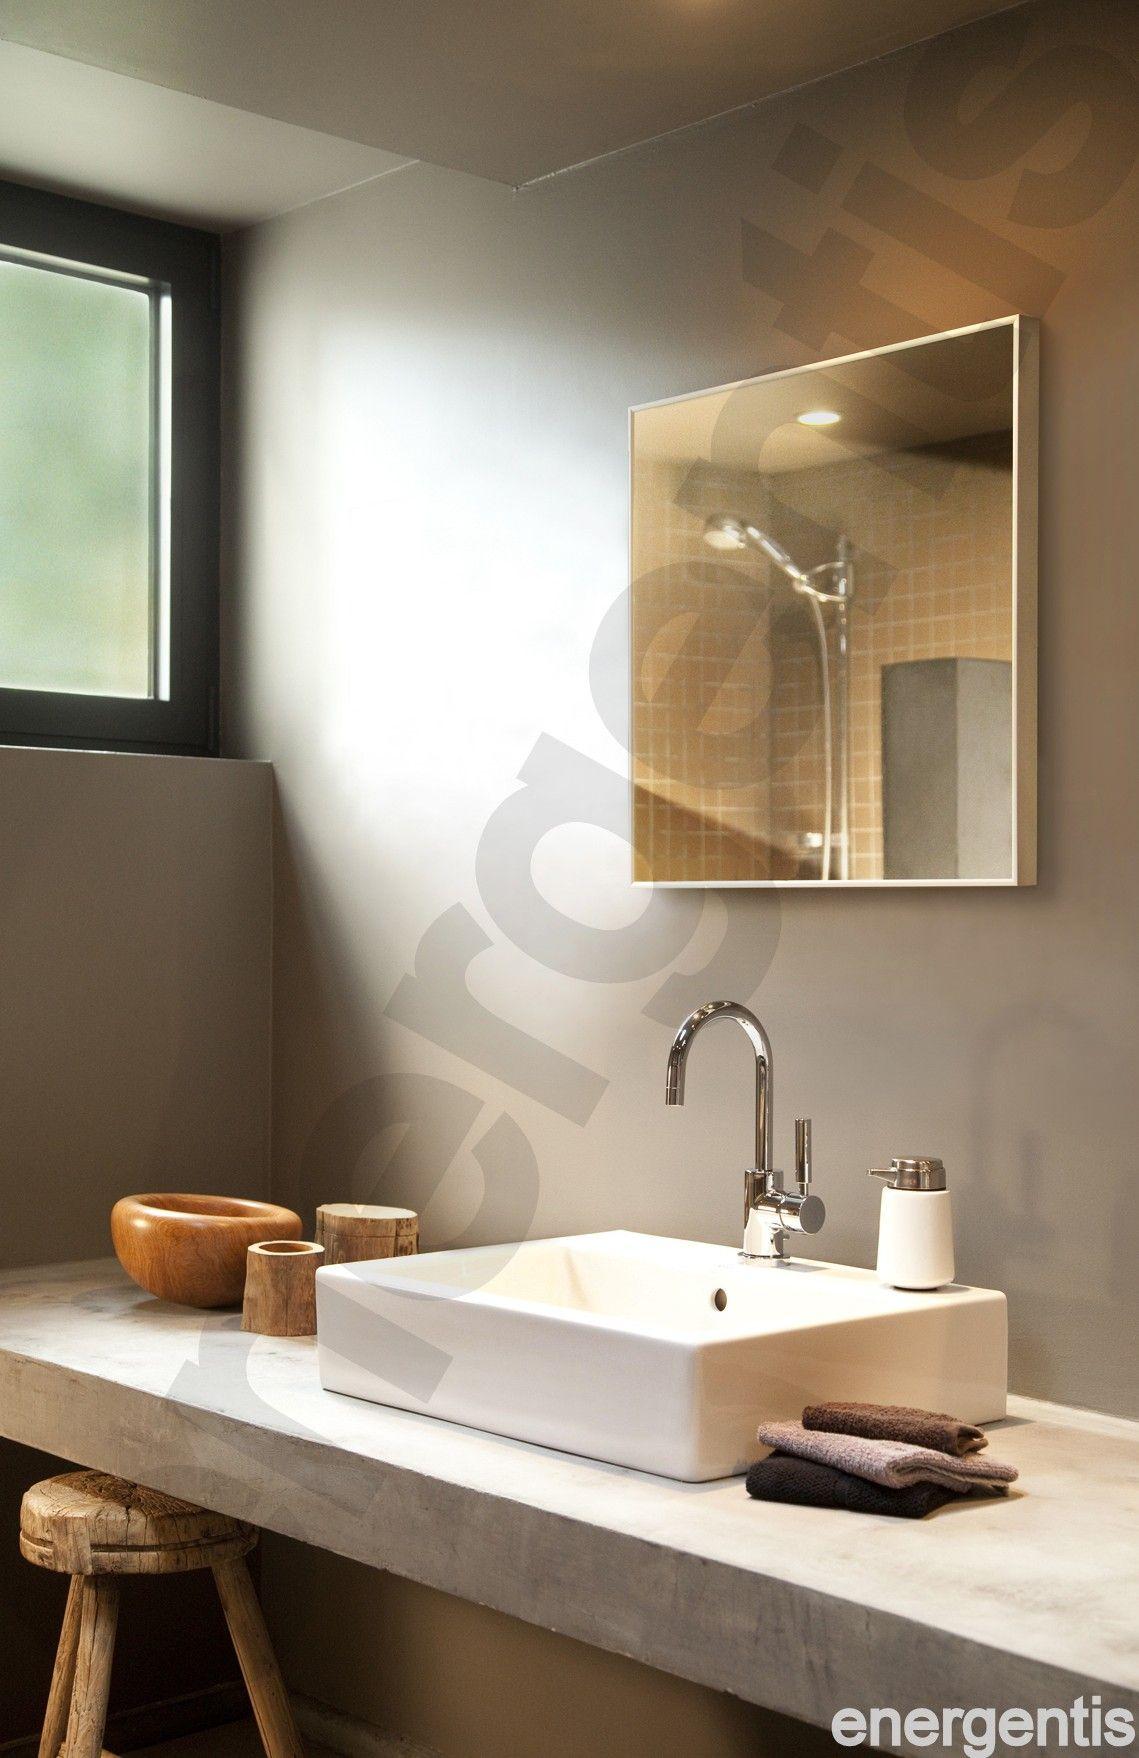 vierkante wasbak hoge kranen badkamer pinterest